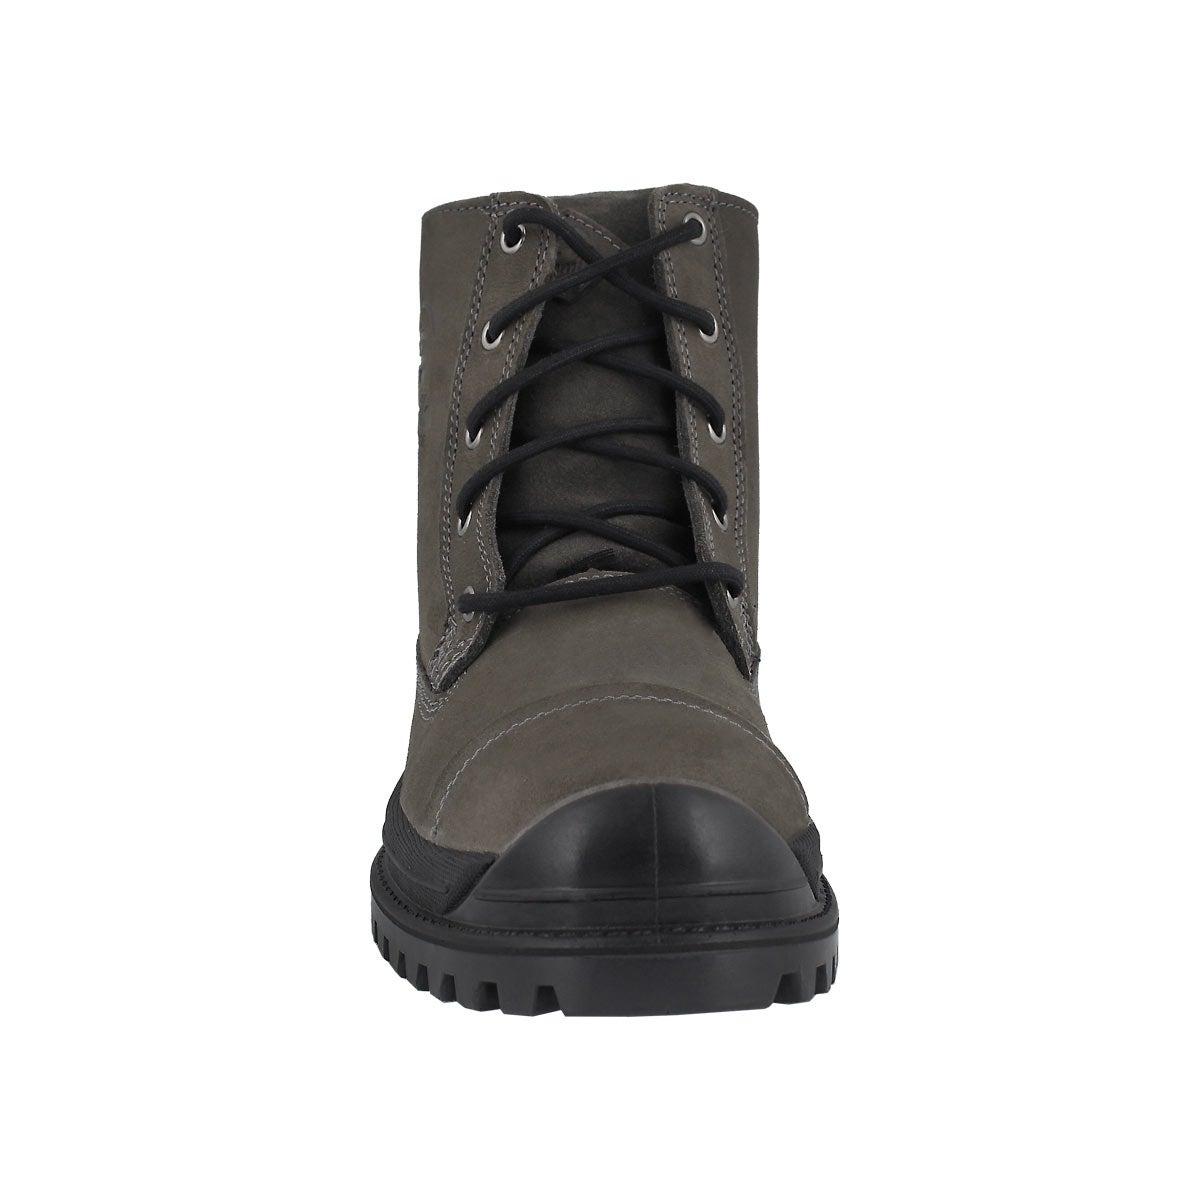 Mns Griffon char laceup wp winter boot